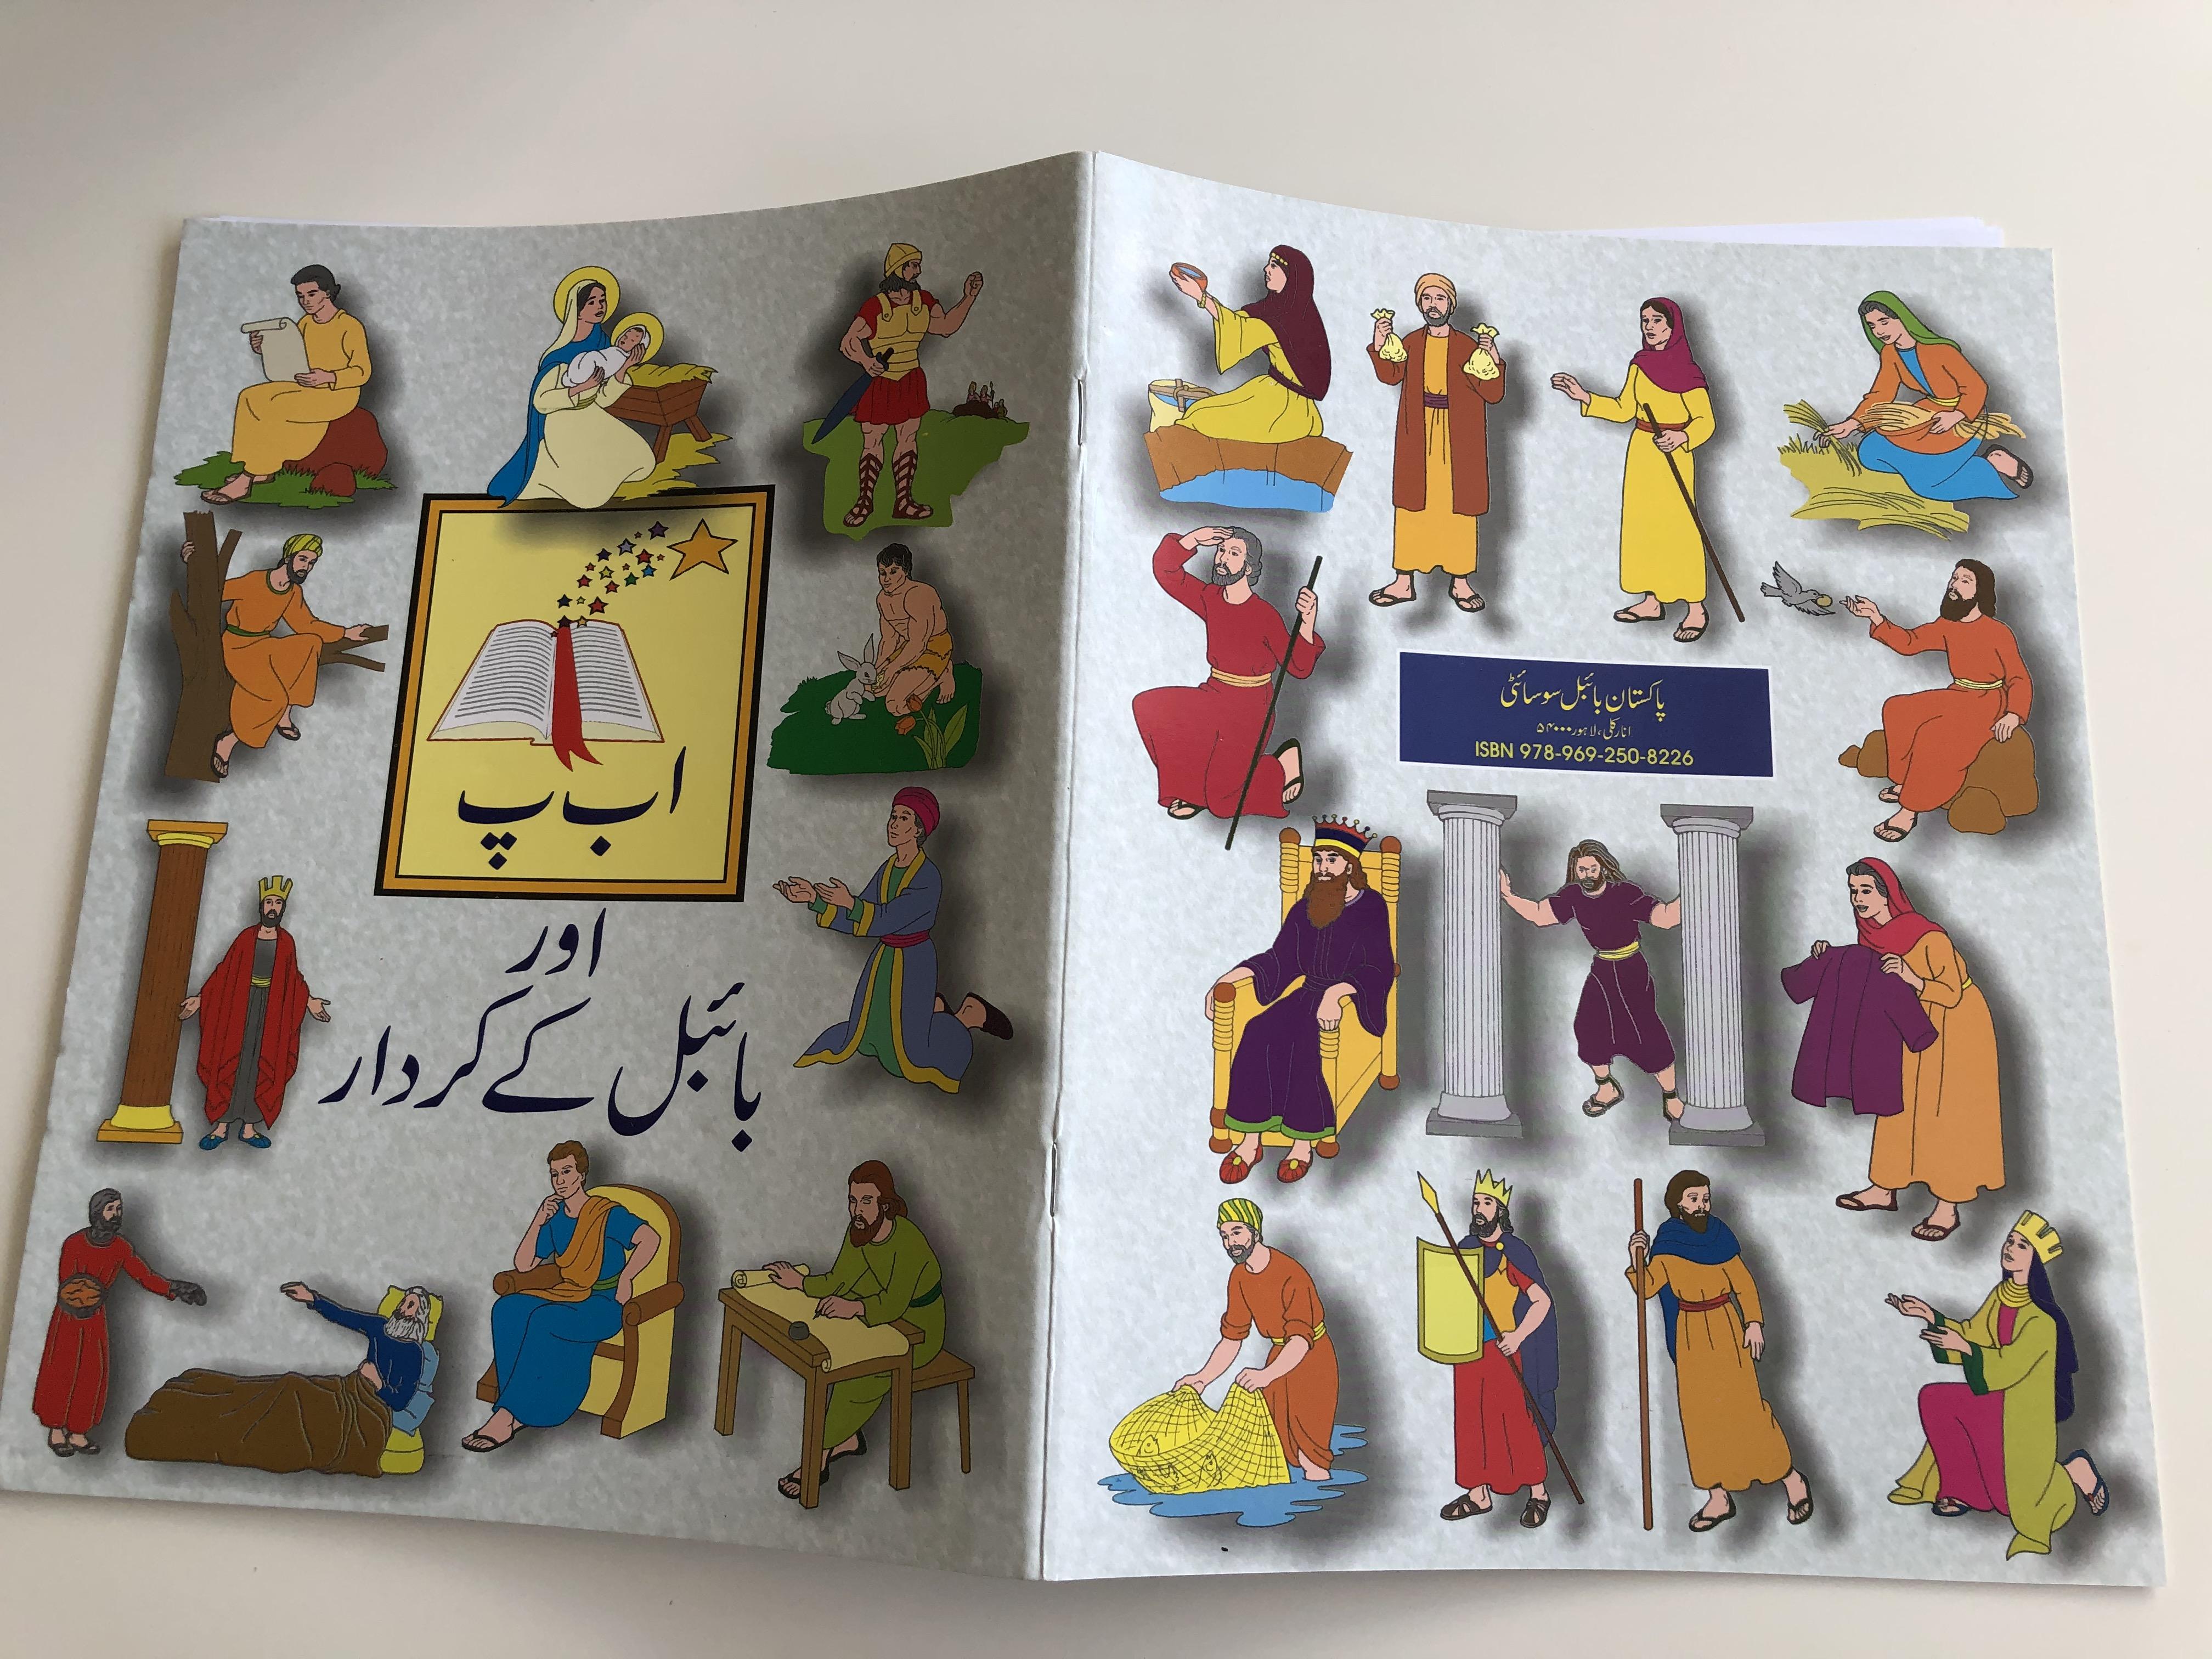 abc-of-the-bible-urdu-language-children-s-coloring-book-paperback-7.jpg